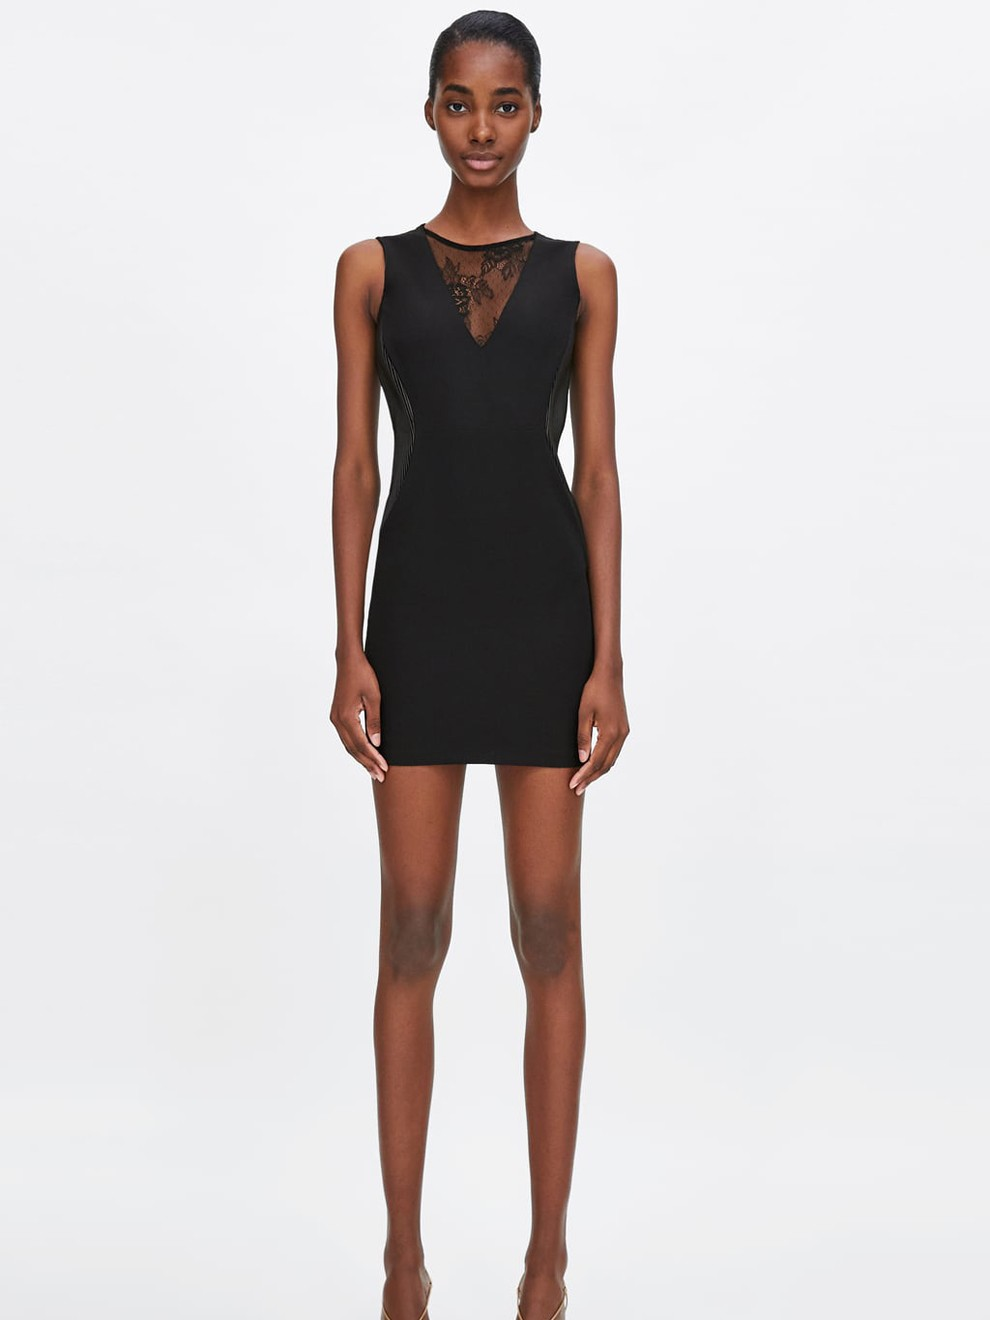 Estiliza tu silueta con un vestido de fiesta de Zara